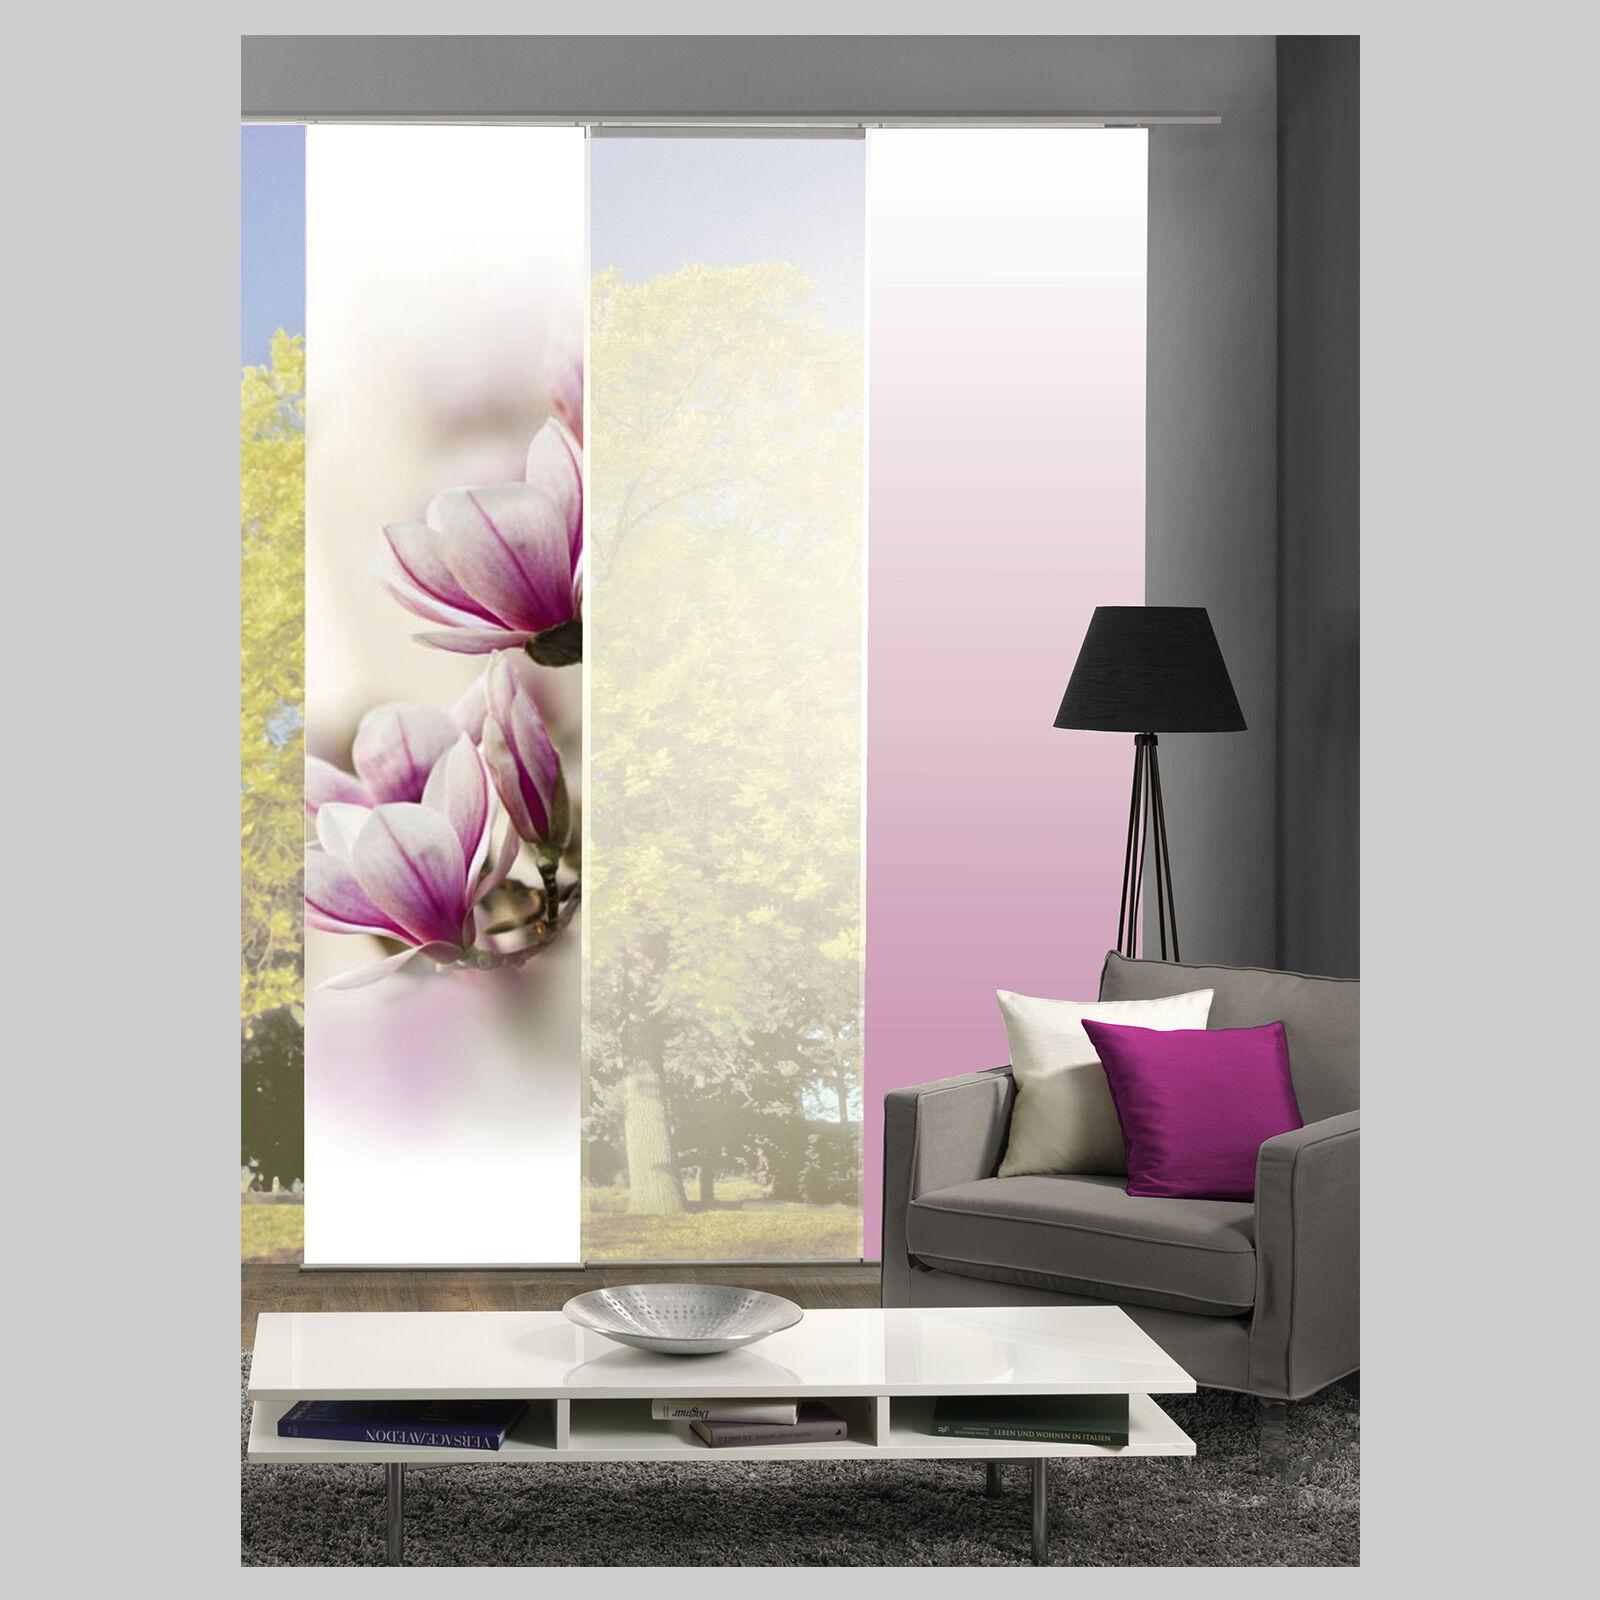 magnene magnolie bl te schiebevorhang raumteiler home wohnideen schmidtgard ebay. Black Bedroom Furniture Sets. Home Design Ideas